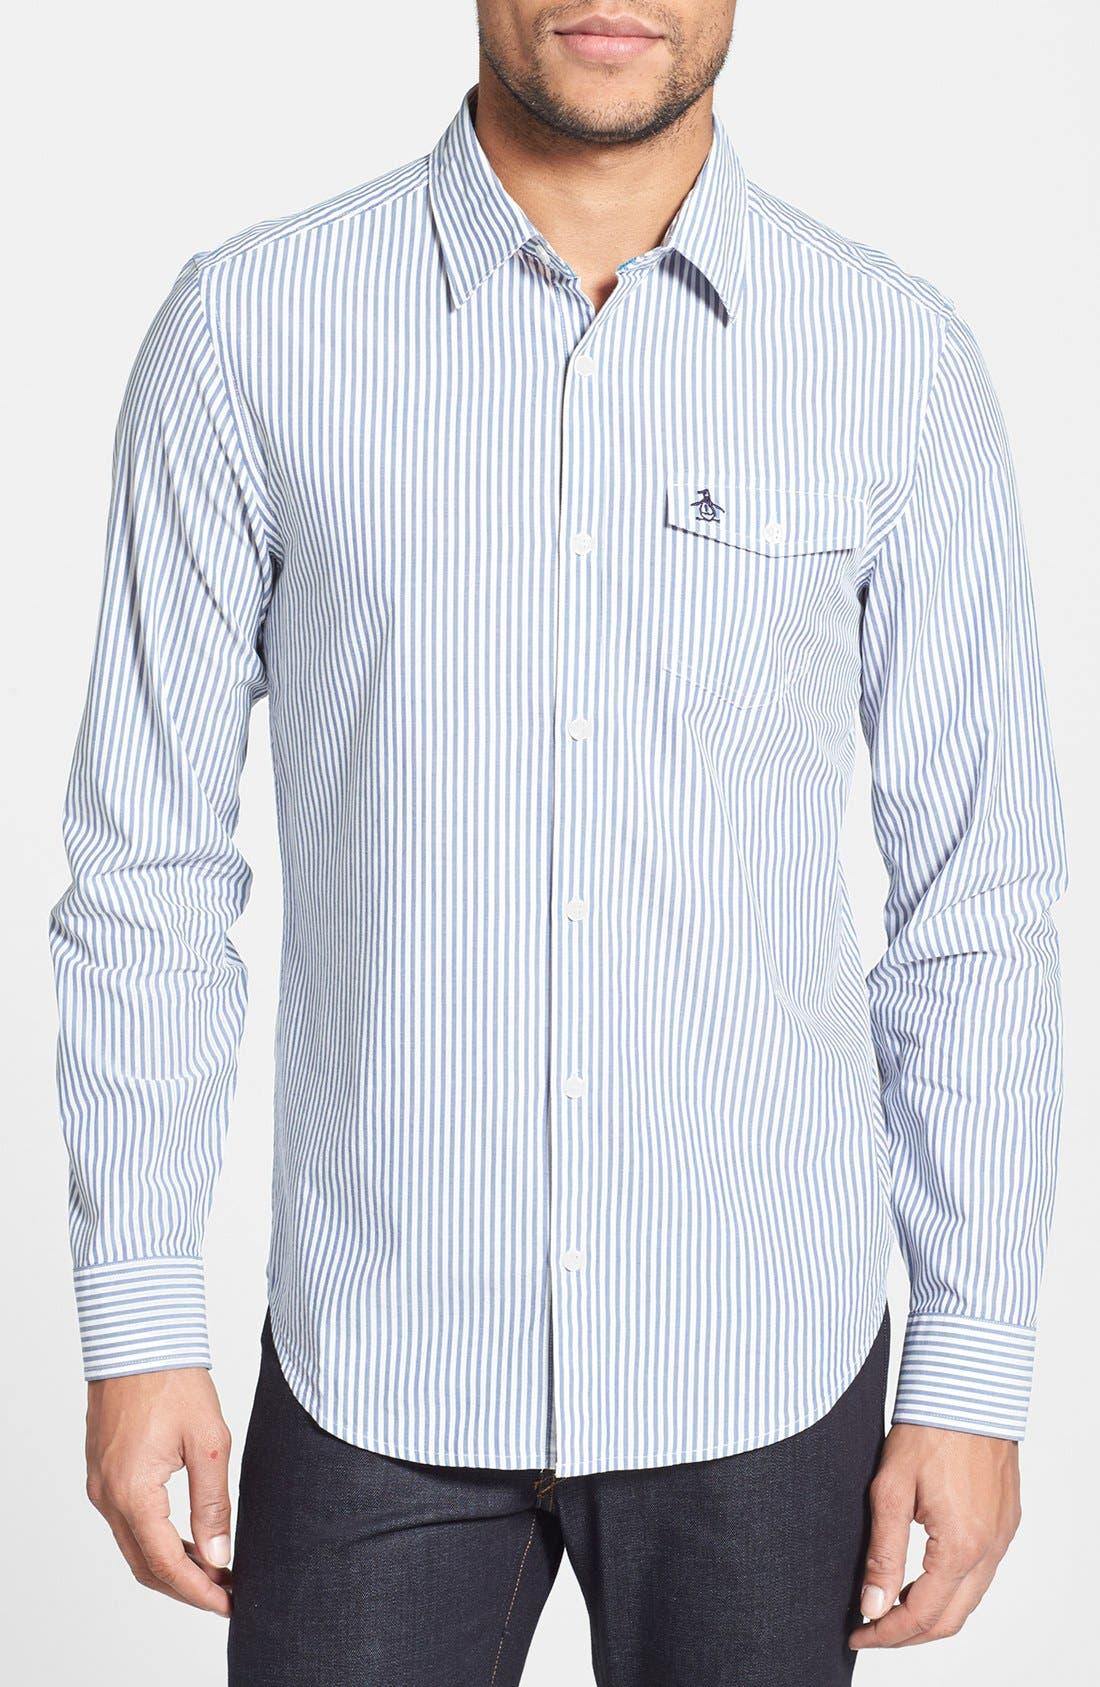 Main Image - Original Penguin Heritage Fit Stripe Sport Shirt